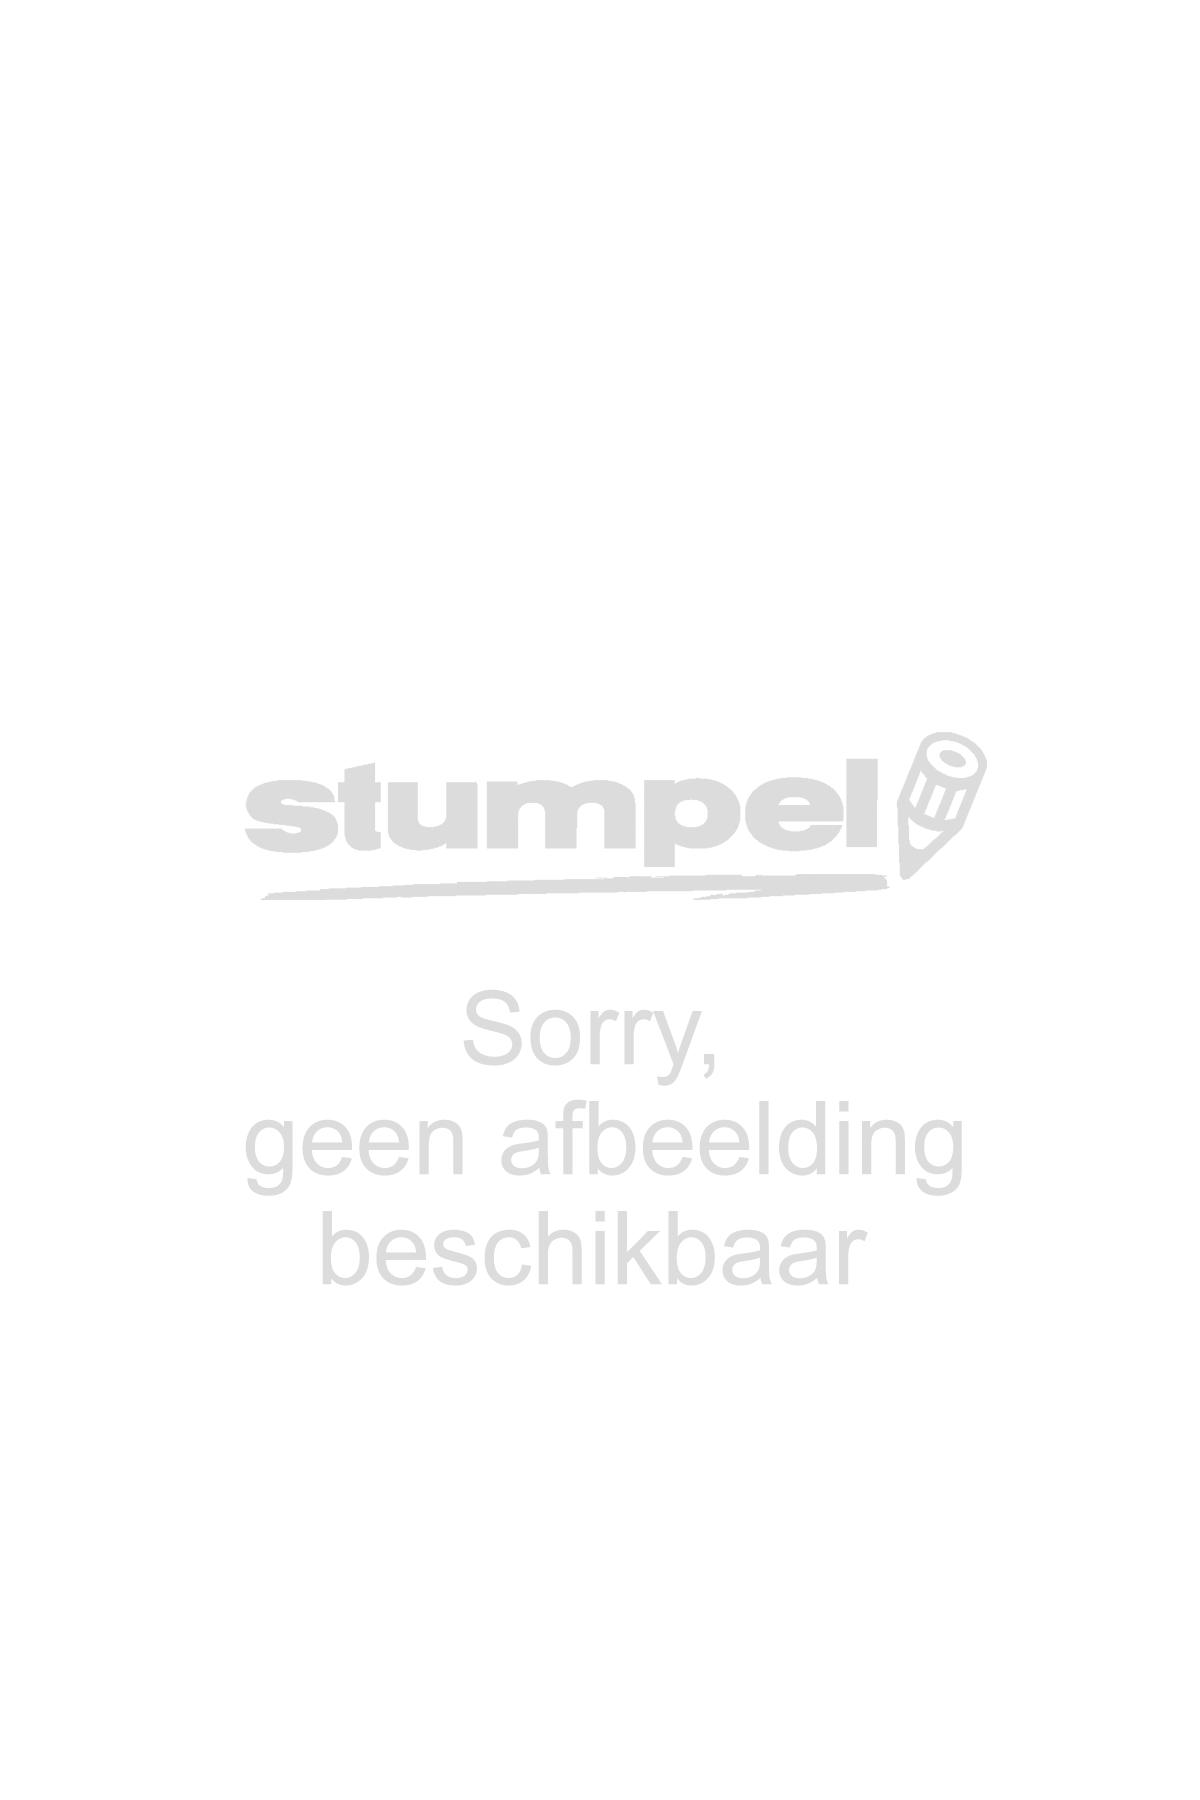 agenda-2021-ryam-efficiency-kort-7-dagen-nl-zwart-11010922